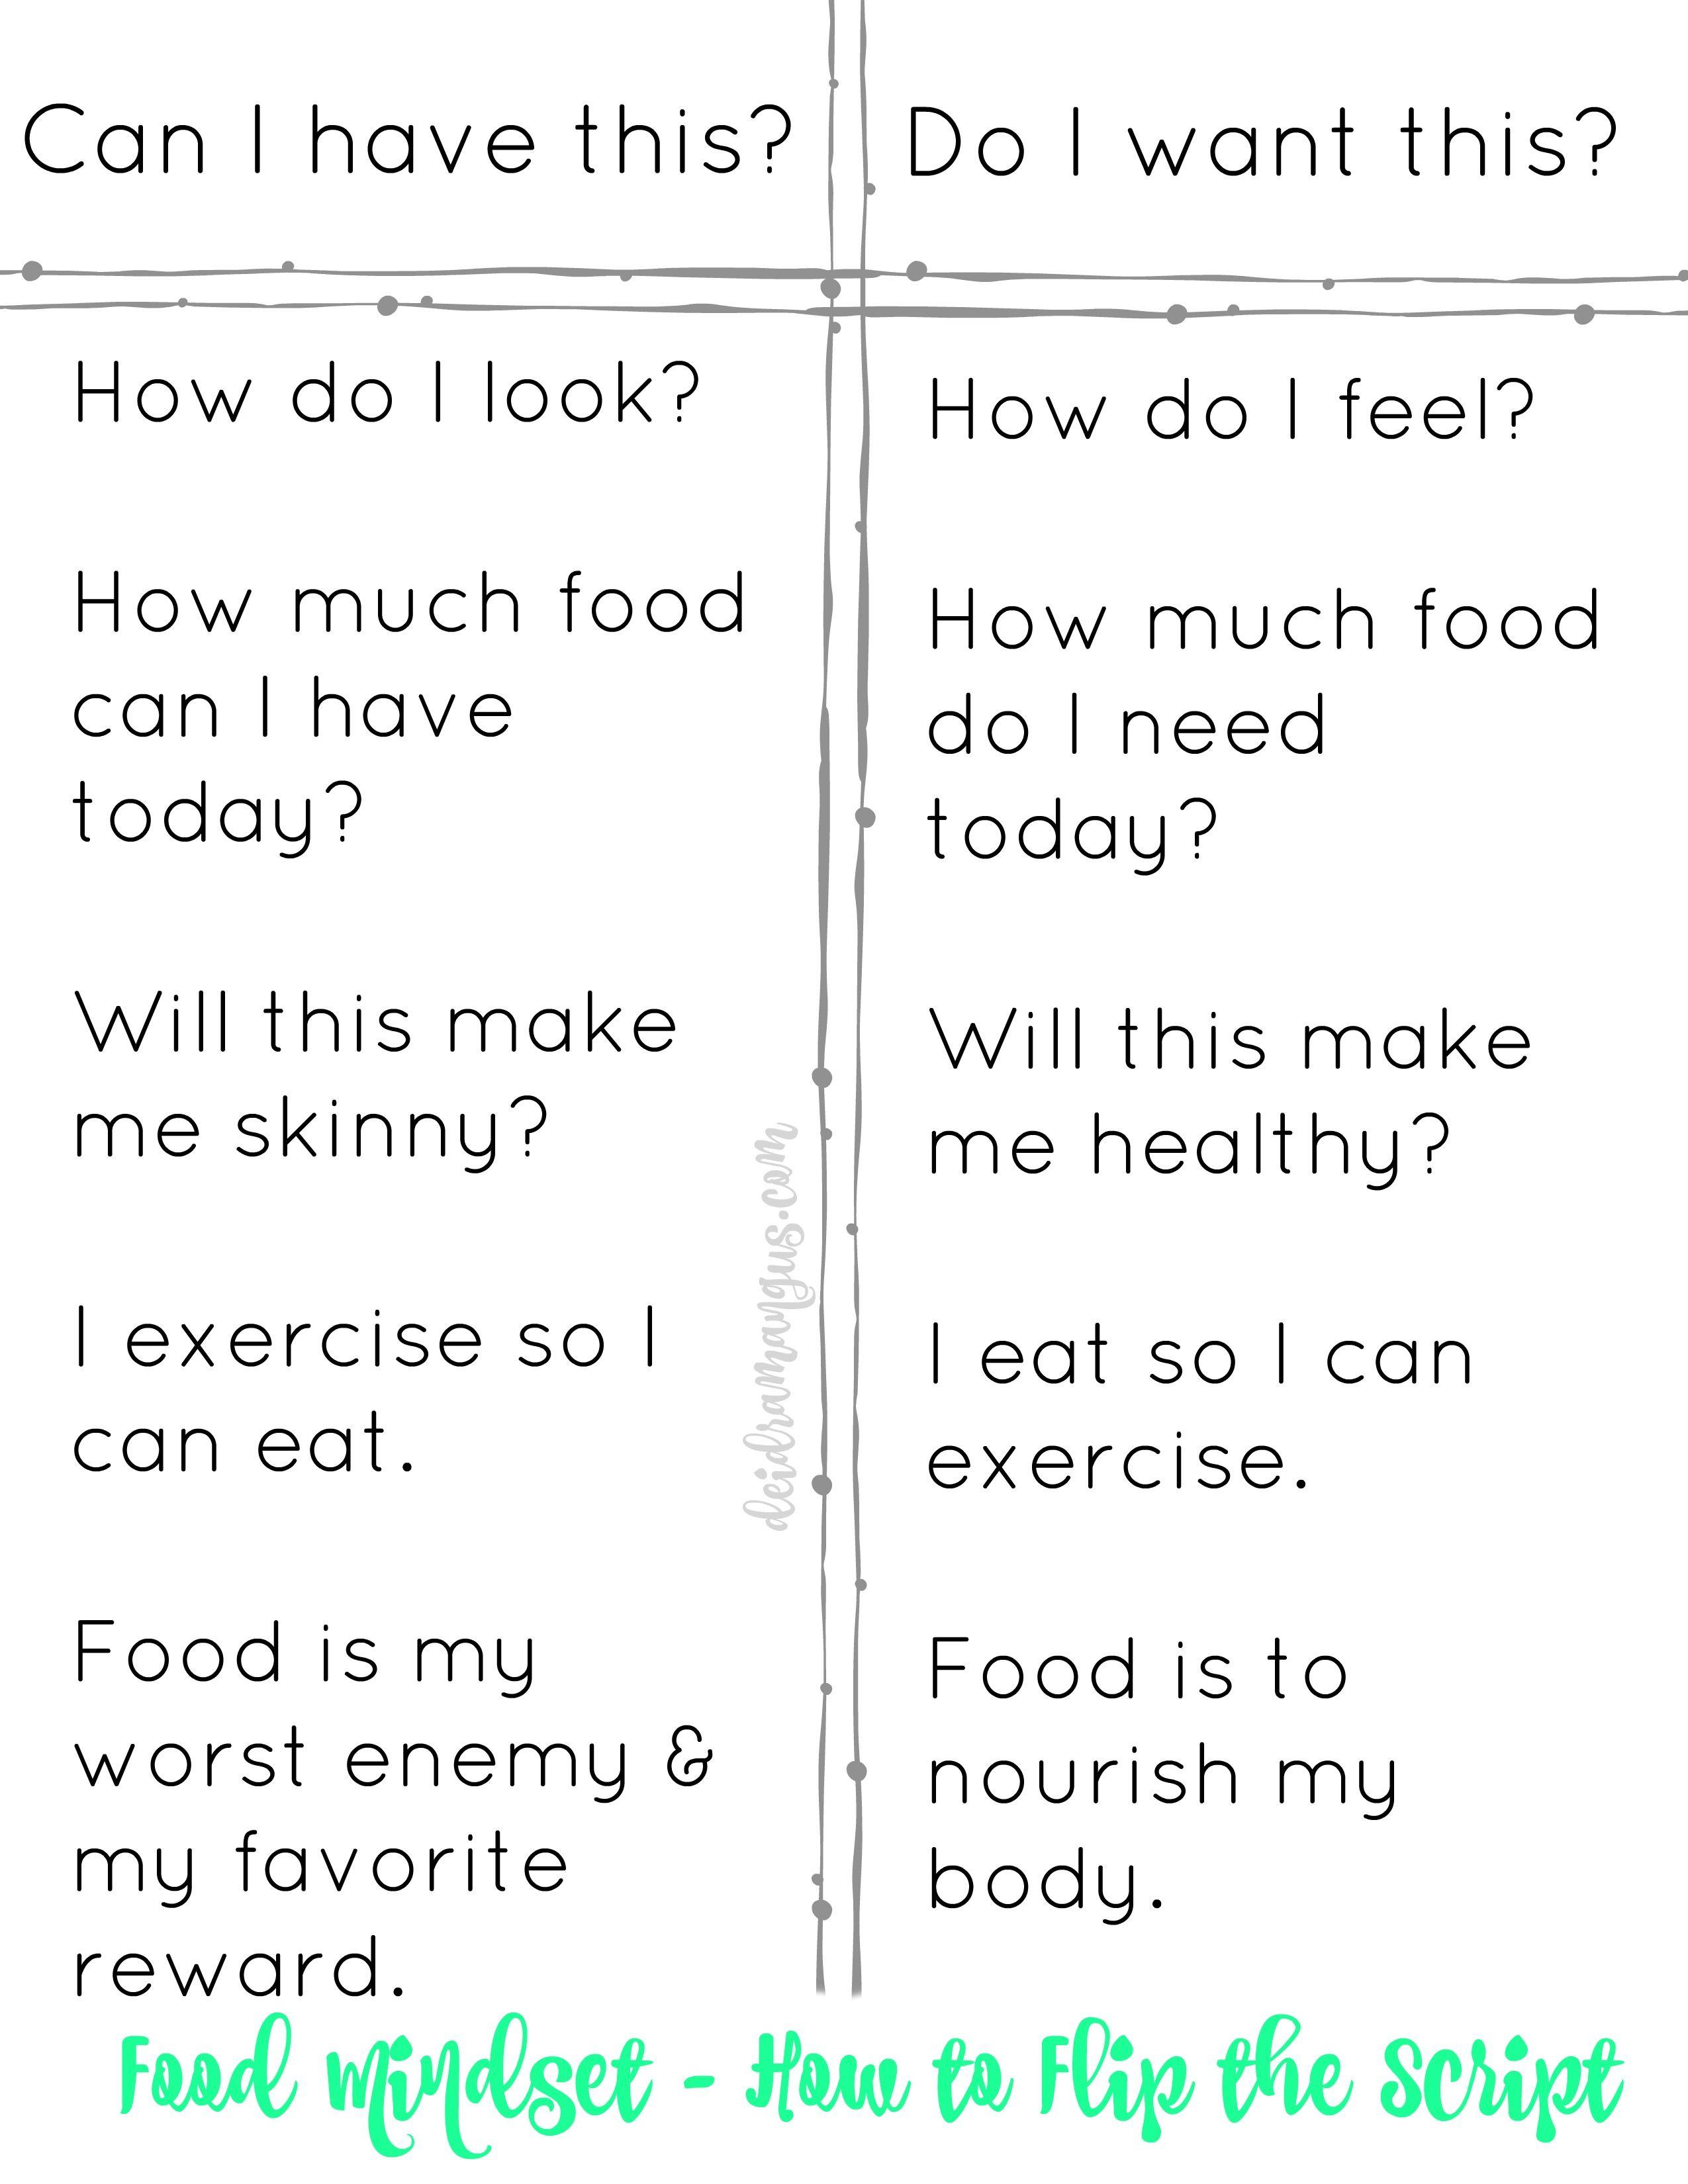 pics Yo-yo dieting cuts life expectancy